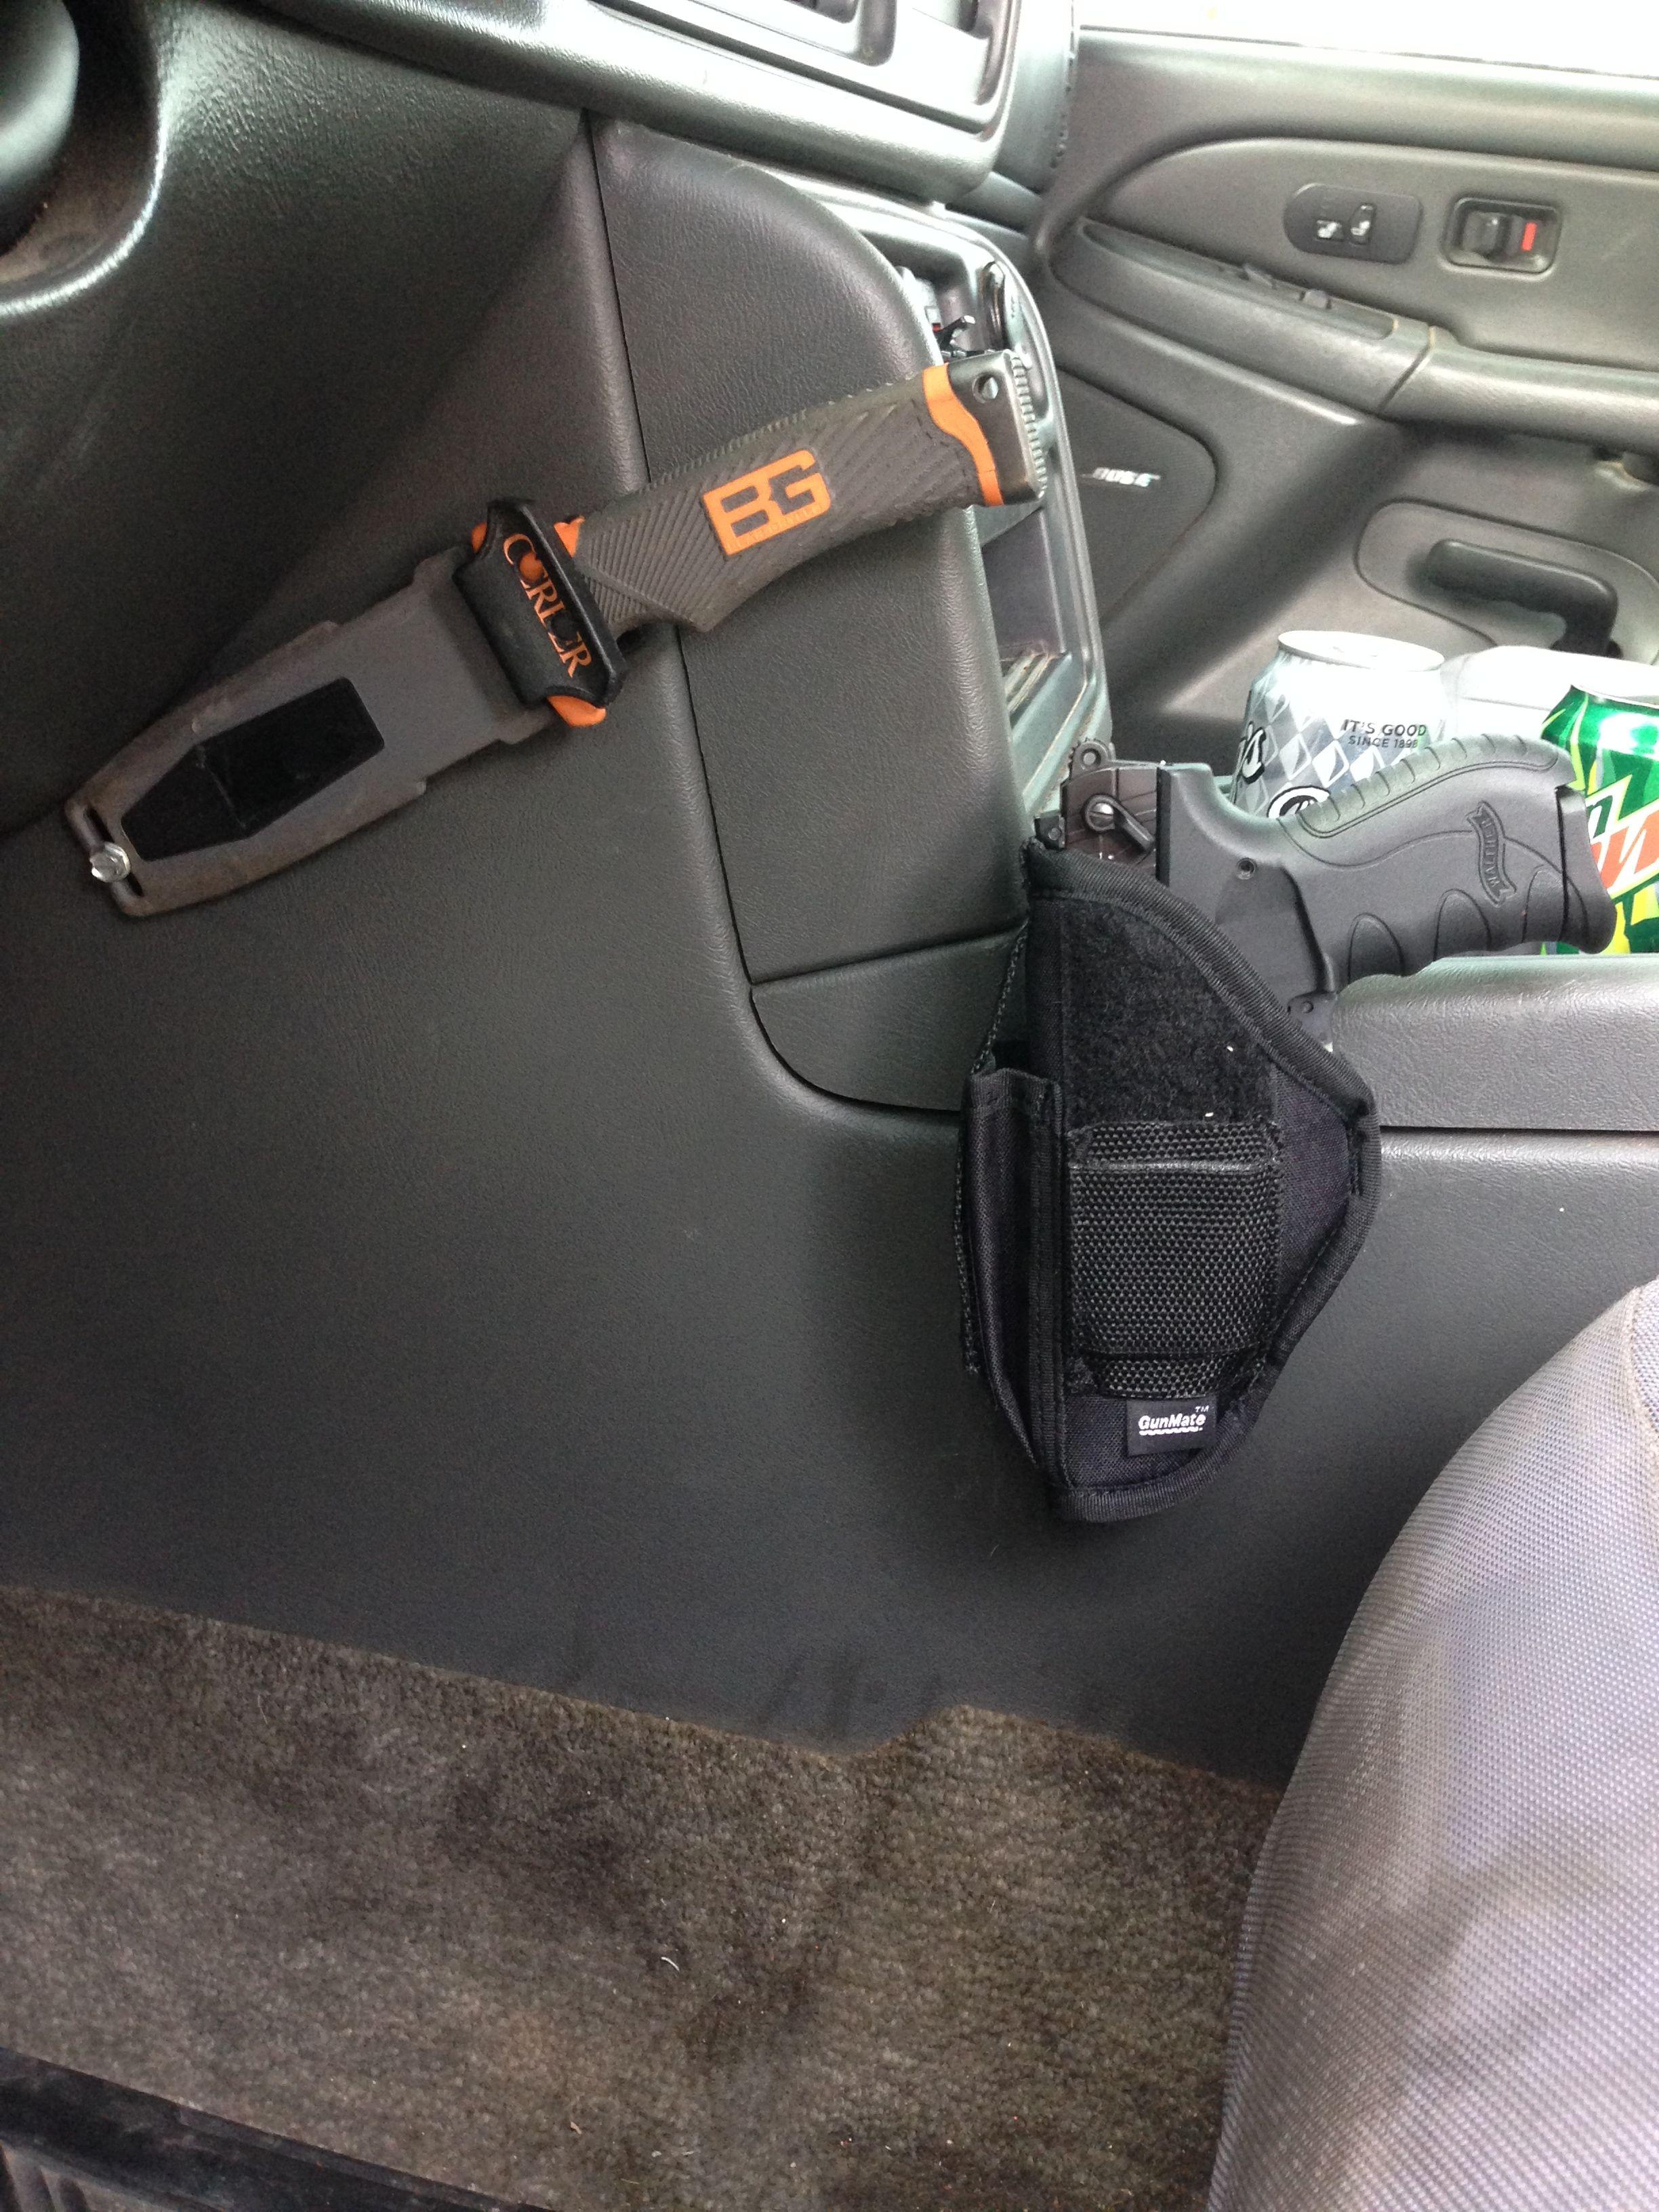 Hunting Responsible Under Table Desk Chair Pistol Holster Gun Concealment Handgun Holders Universal Hidden Concealed Holsters For Vehicle Car Doors Sports & Entertainment